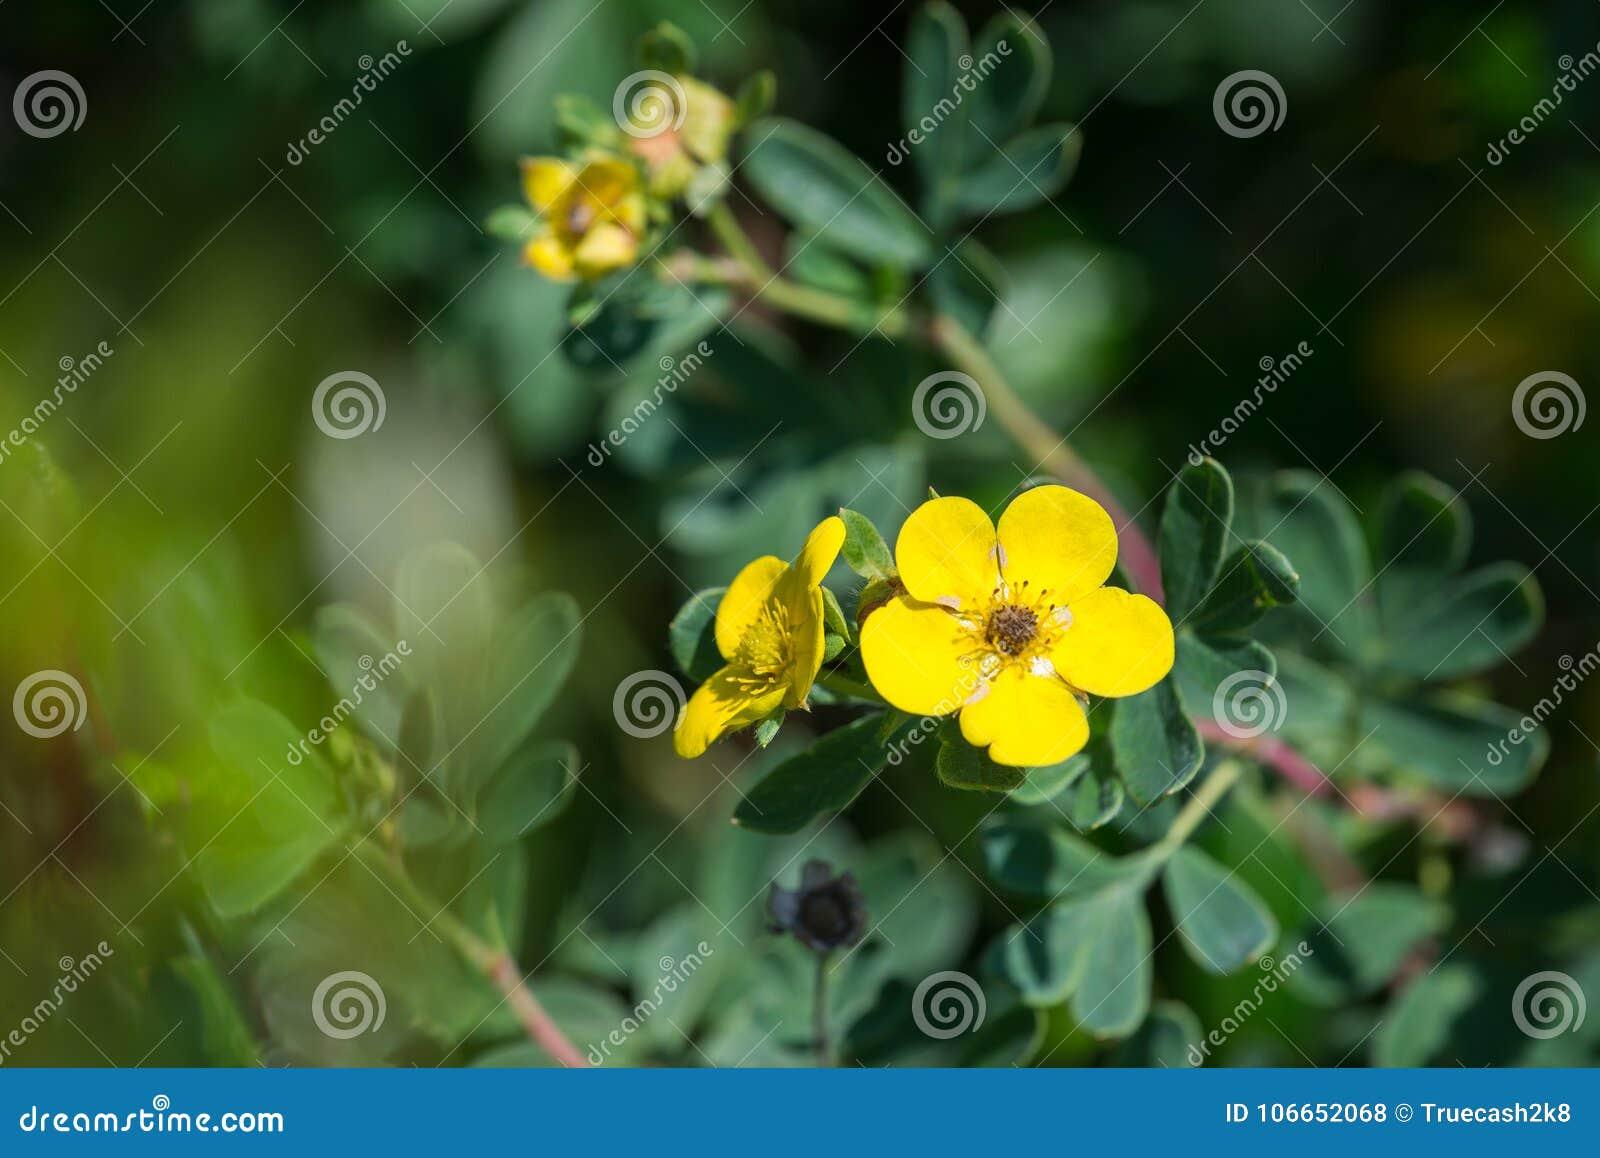 Wild dasiphora fruticosa yellow flowers blossoms closeup shot wild dasiphora fruticosa yellow flowers blossoms closeup shot mightylinksfo